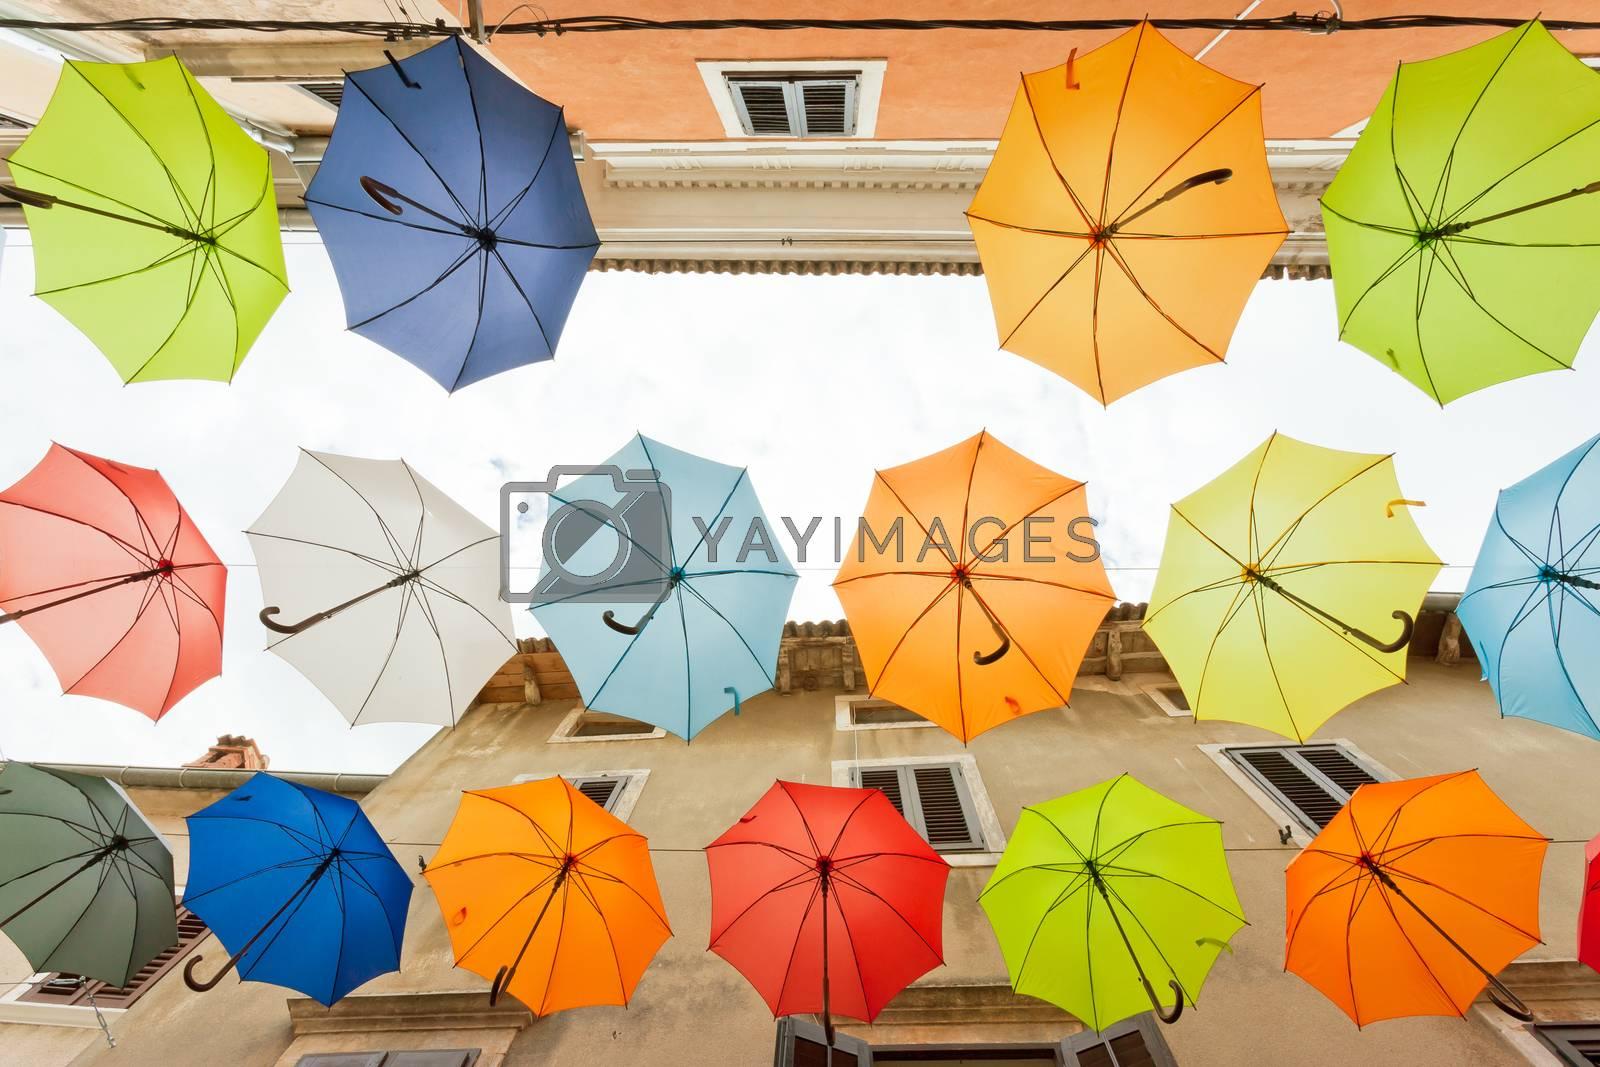 Novigrad, Istria, Croatia, Europe - Find the mistake - One umbrella is missing